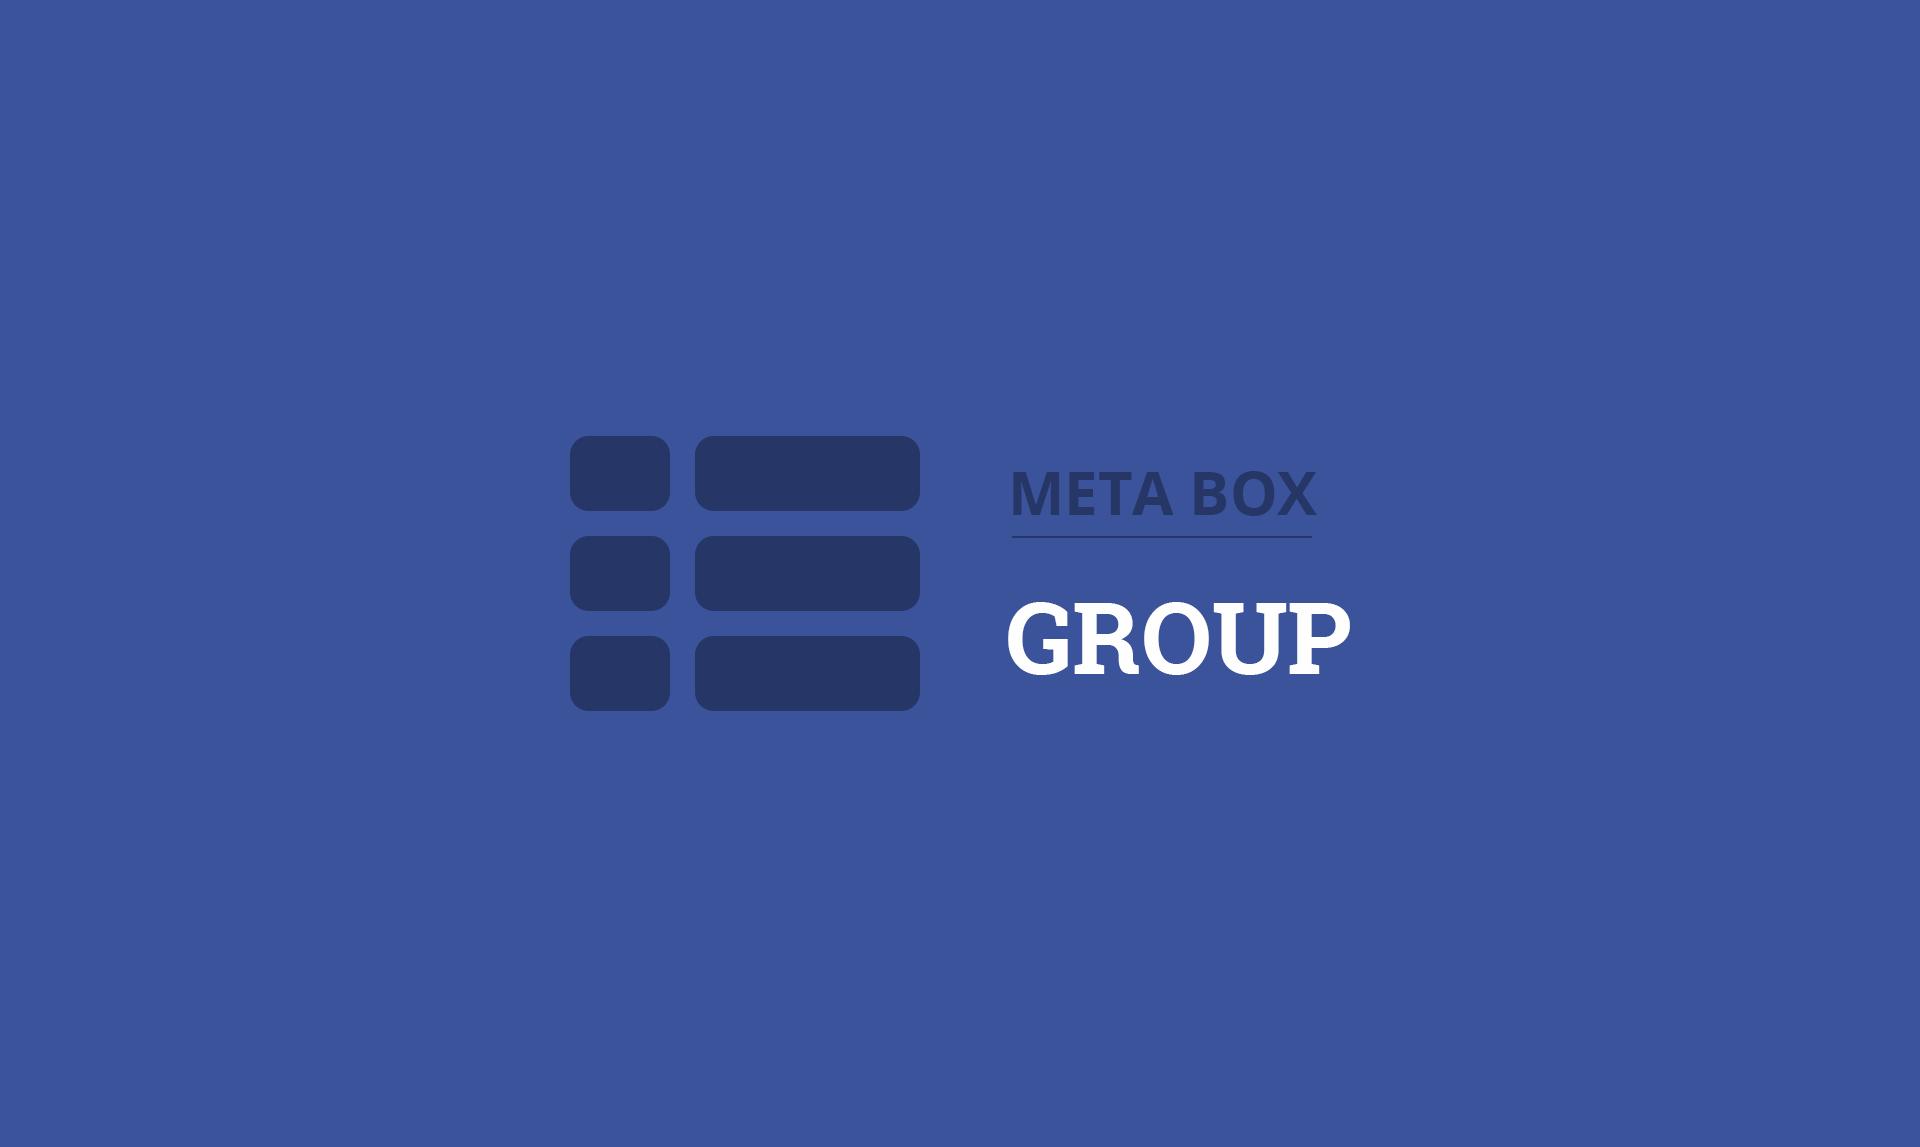 Meta Box Group